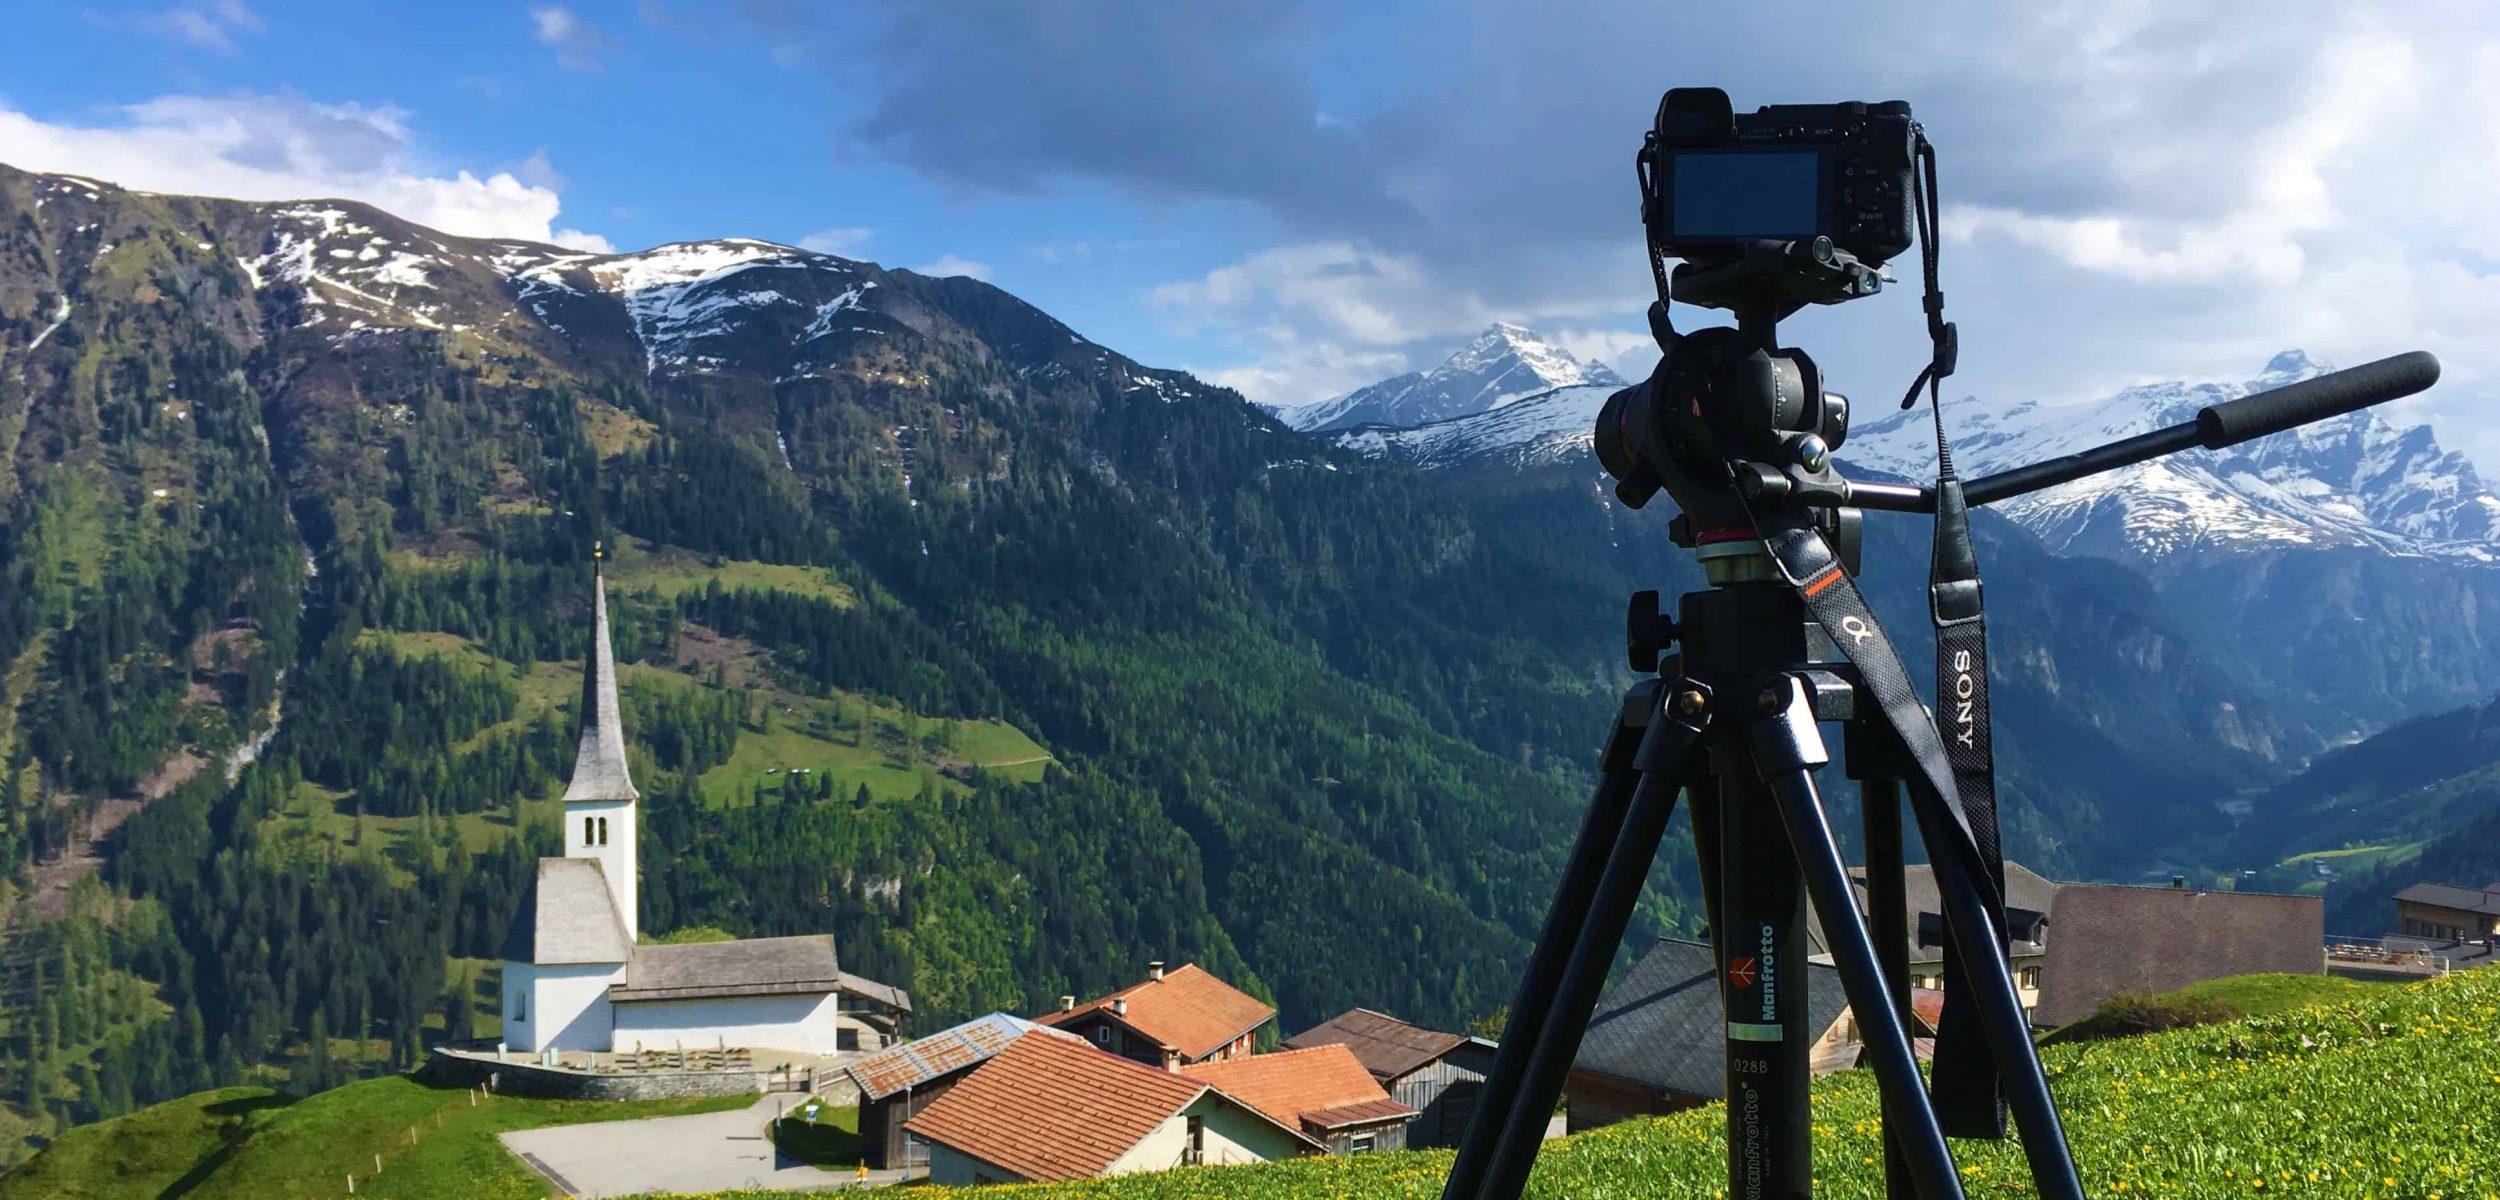 Videoblog